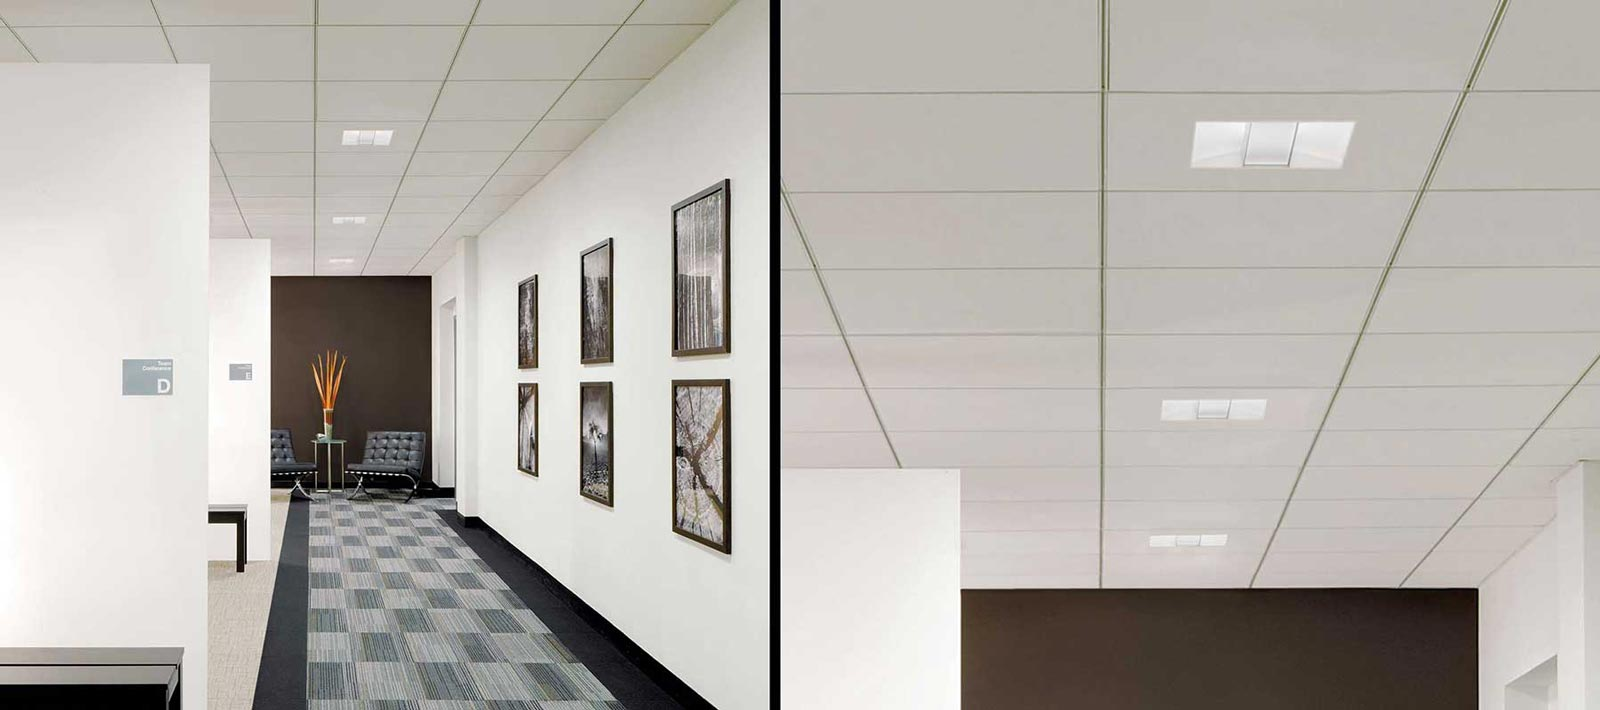 Corridor Focal Point Lights